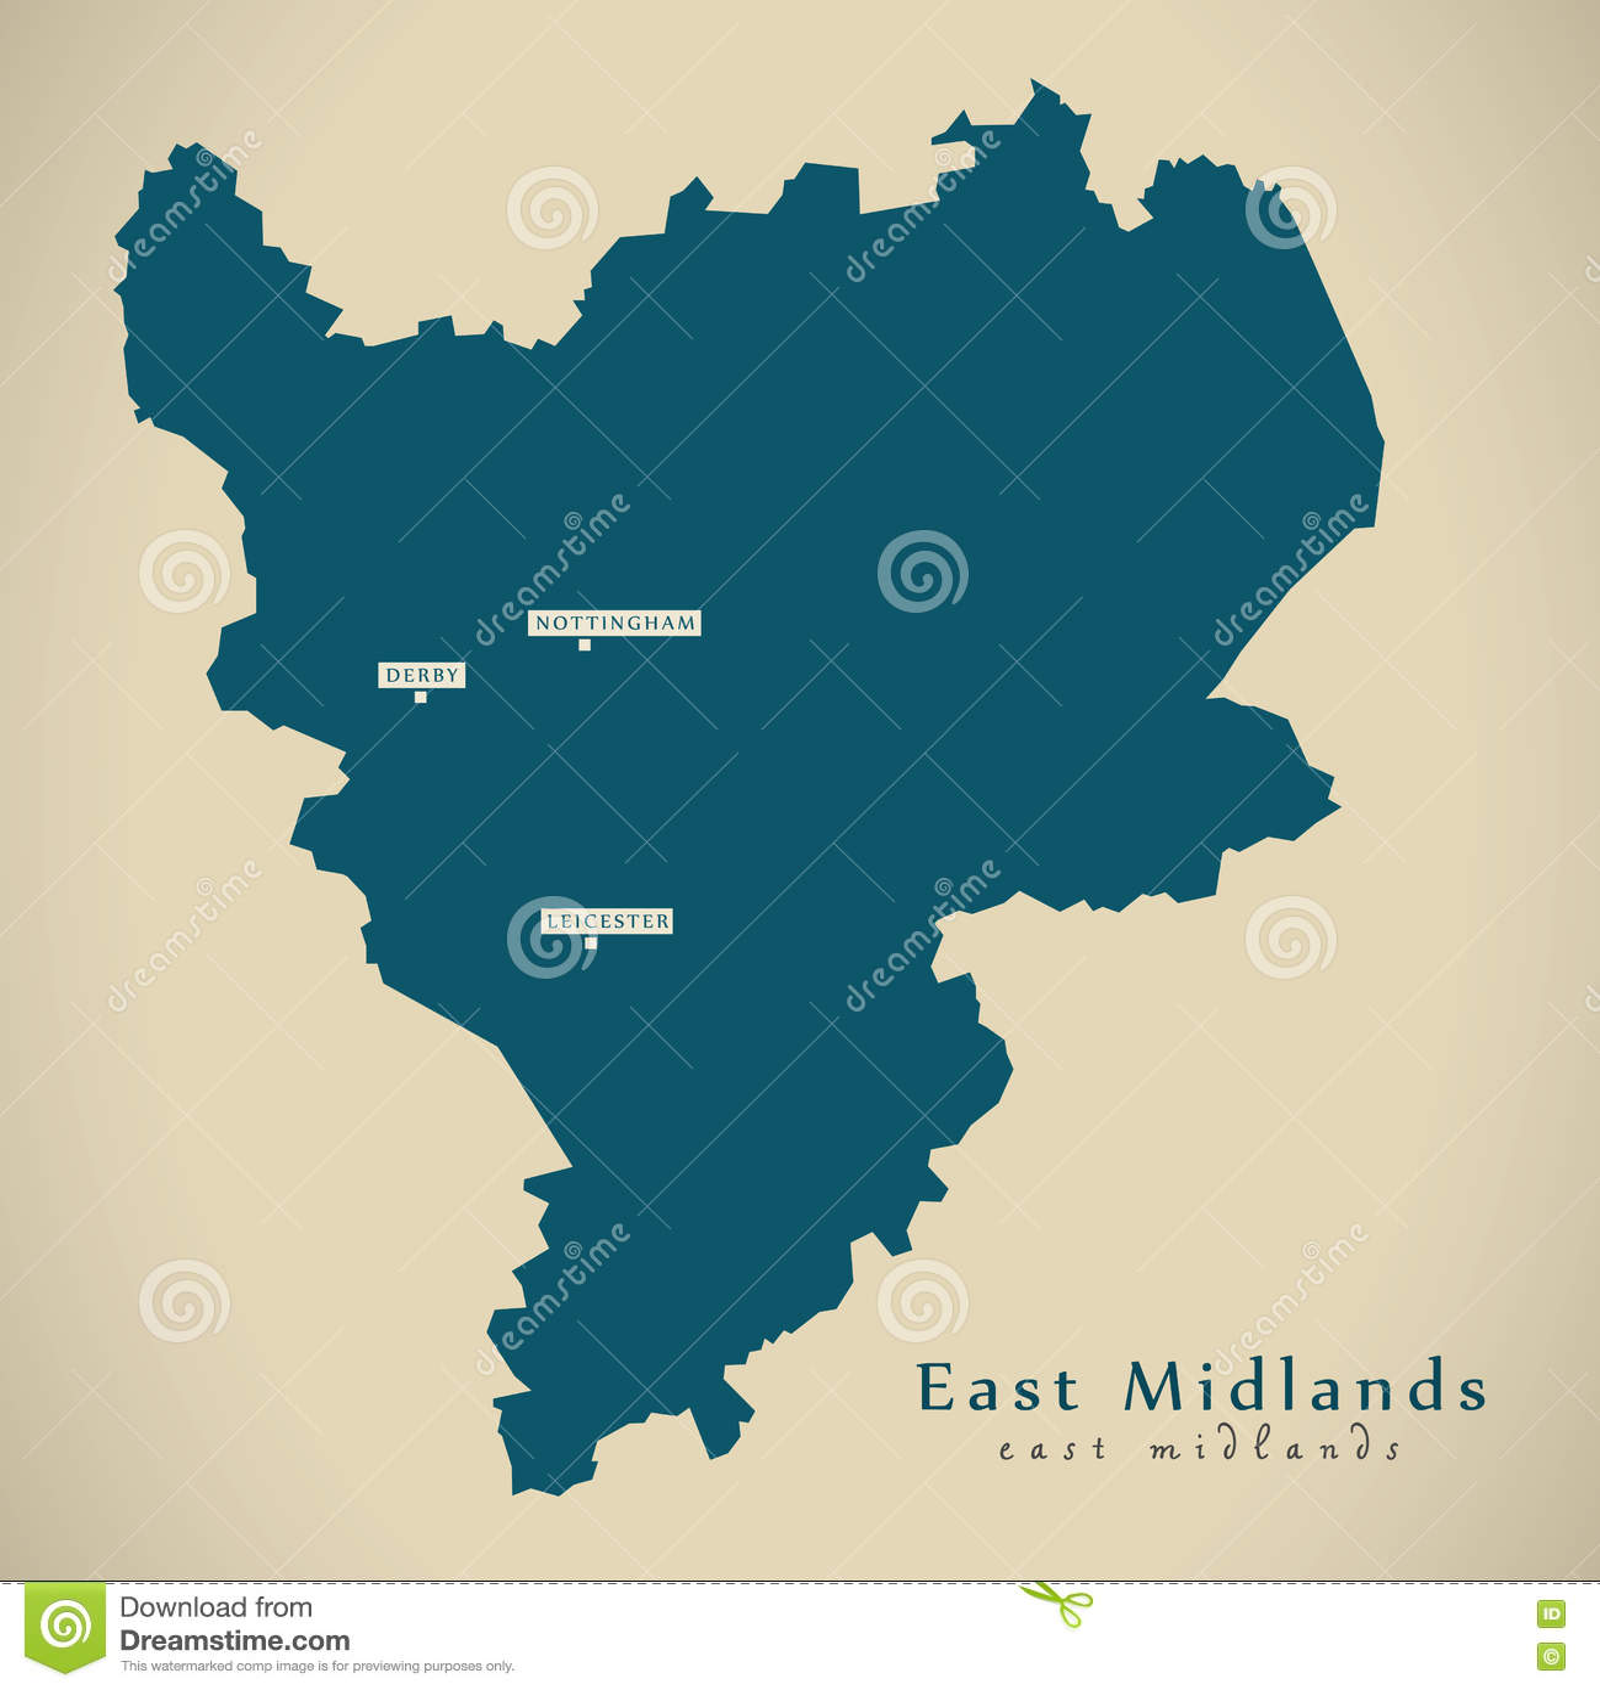 Map Of England Provinces.Modern Map East Midlands Uk England Stock Illustration